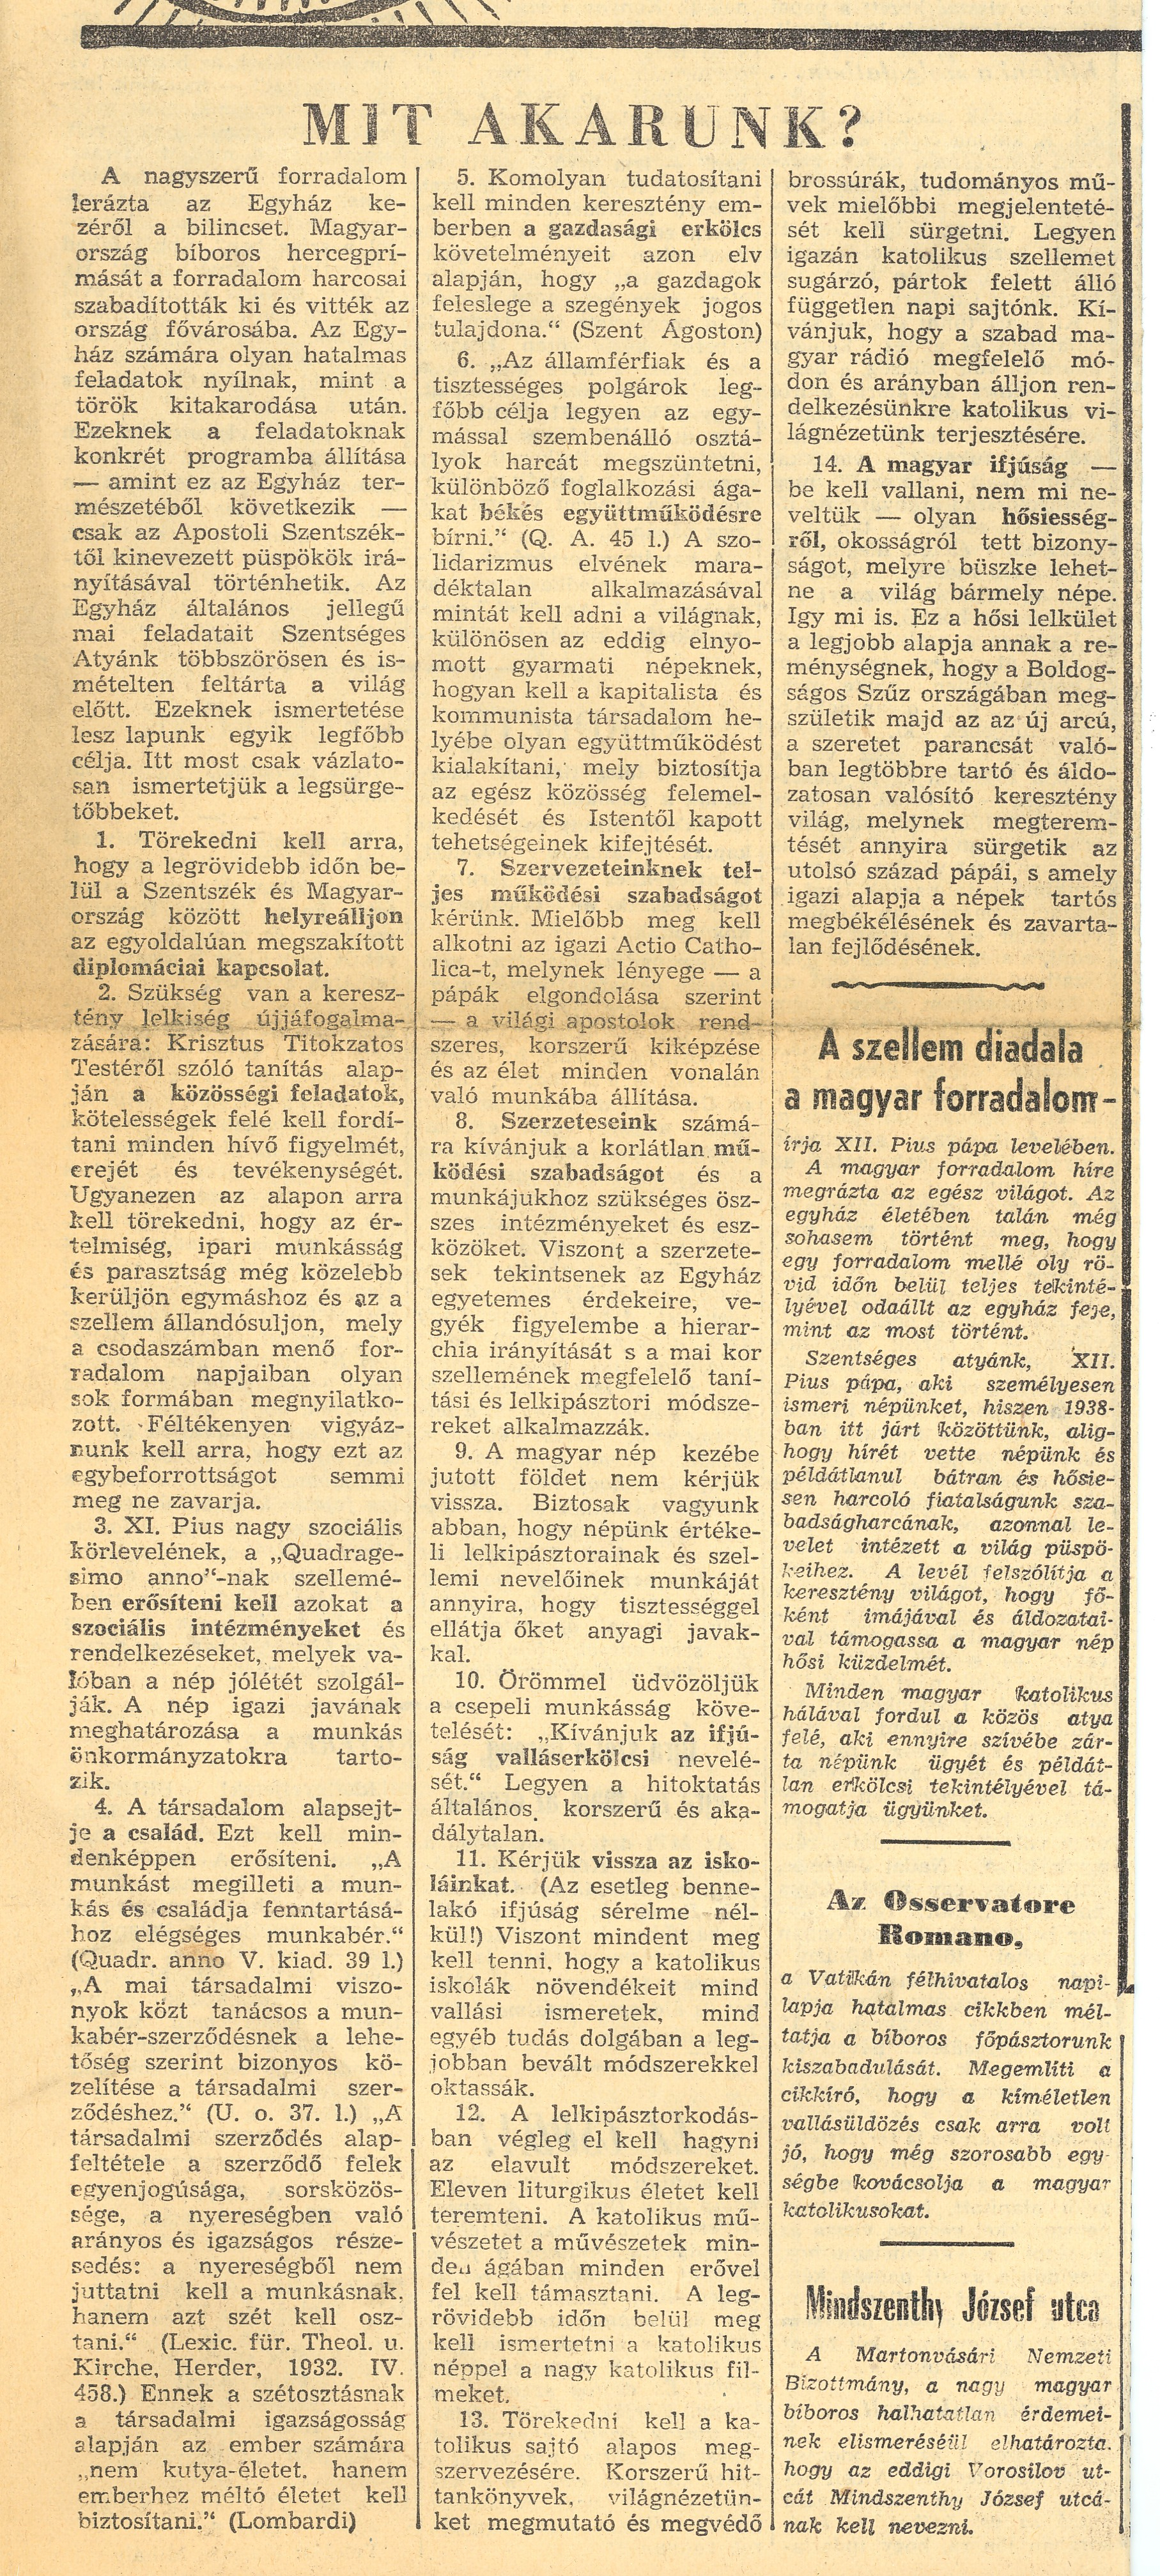 da6bab13741e Budapest januártól márciusig [Budapest from January to March], 1957 [in  Hungarian] Page 1 2. Lábhoz tett fegyverrel [Arms layed down], Irodalmi  újság, ...